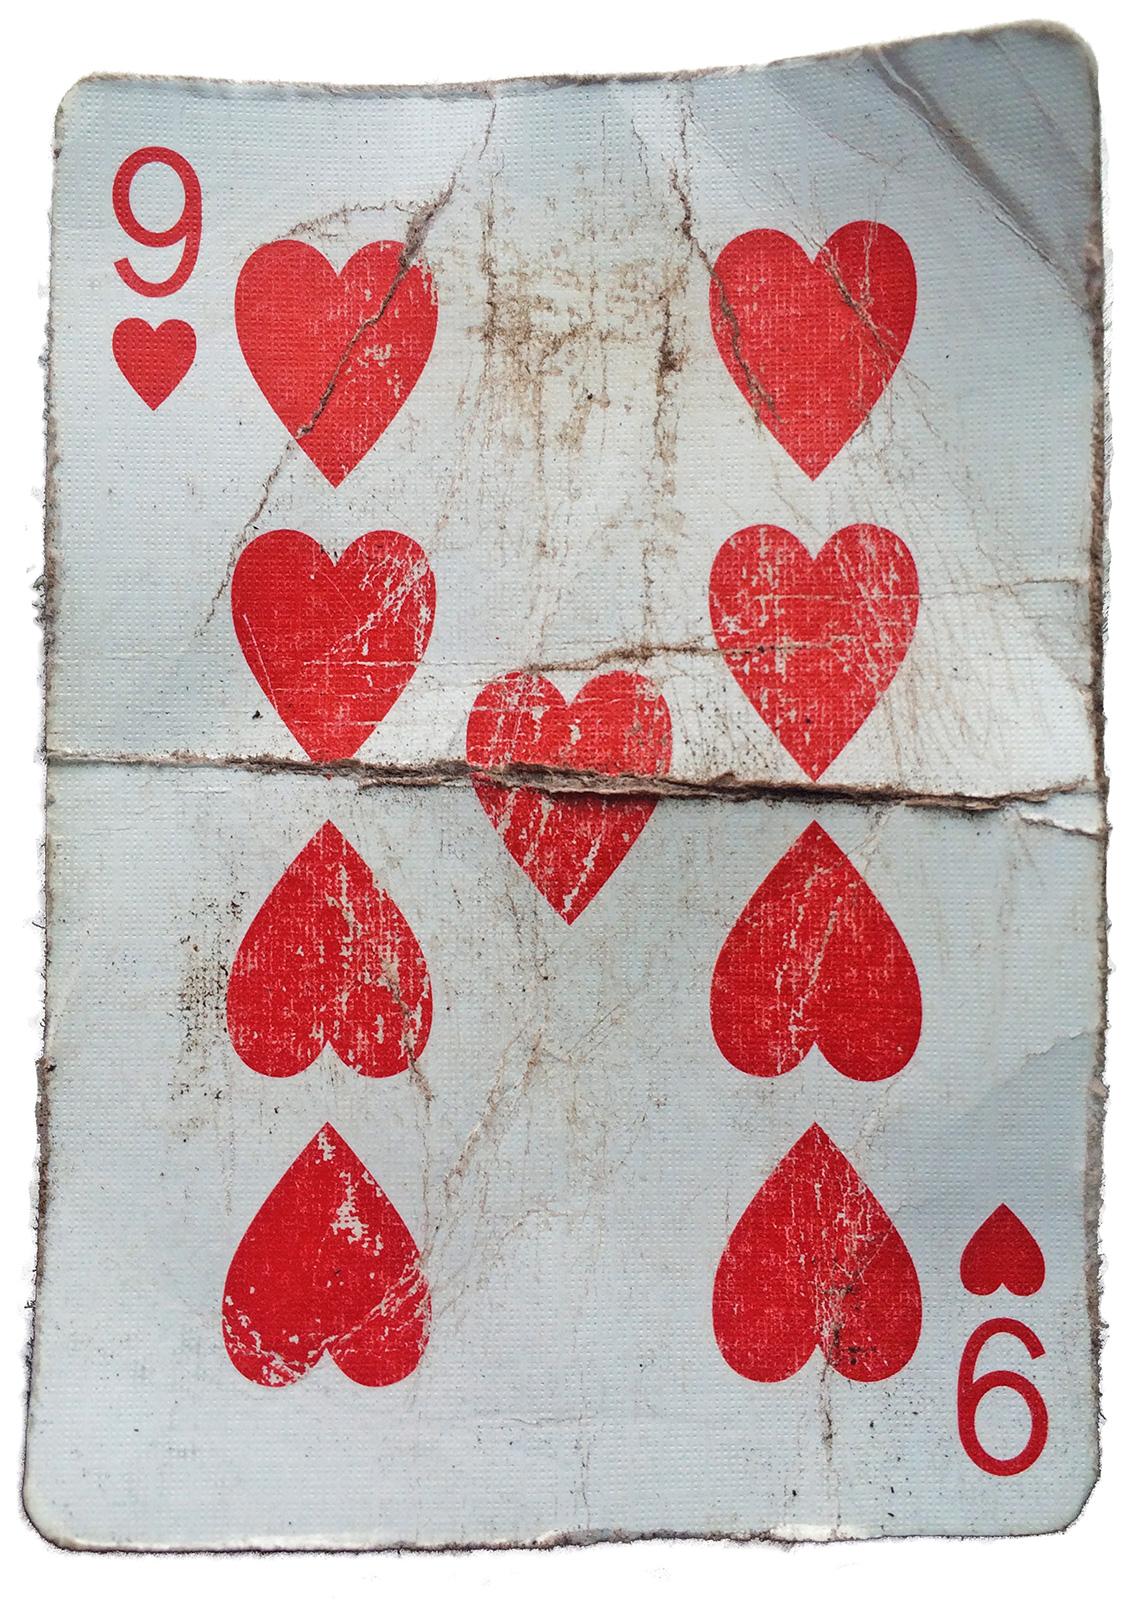 168_playingcard_Mark-1200.jpg